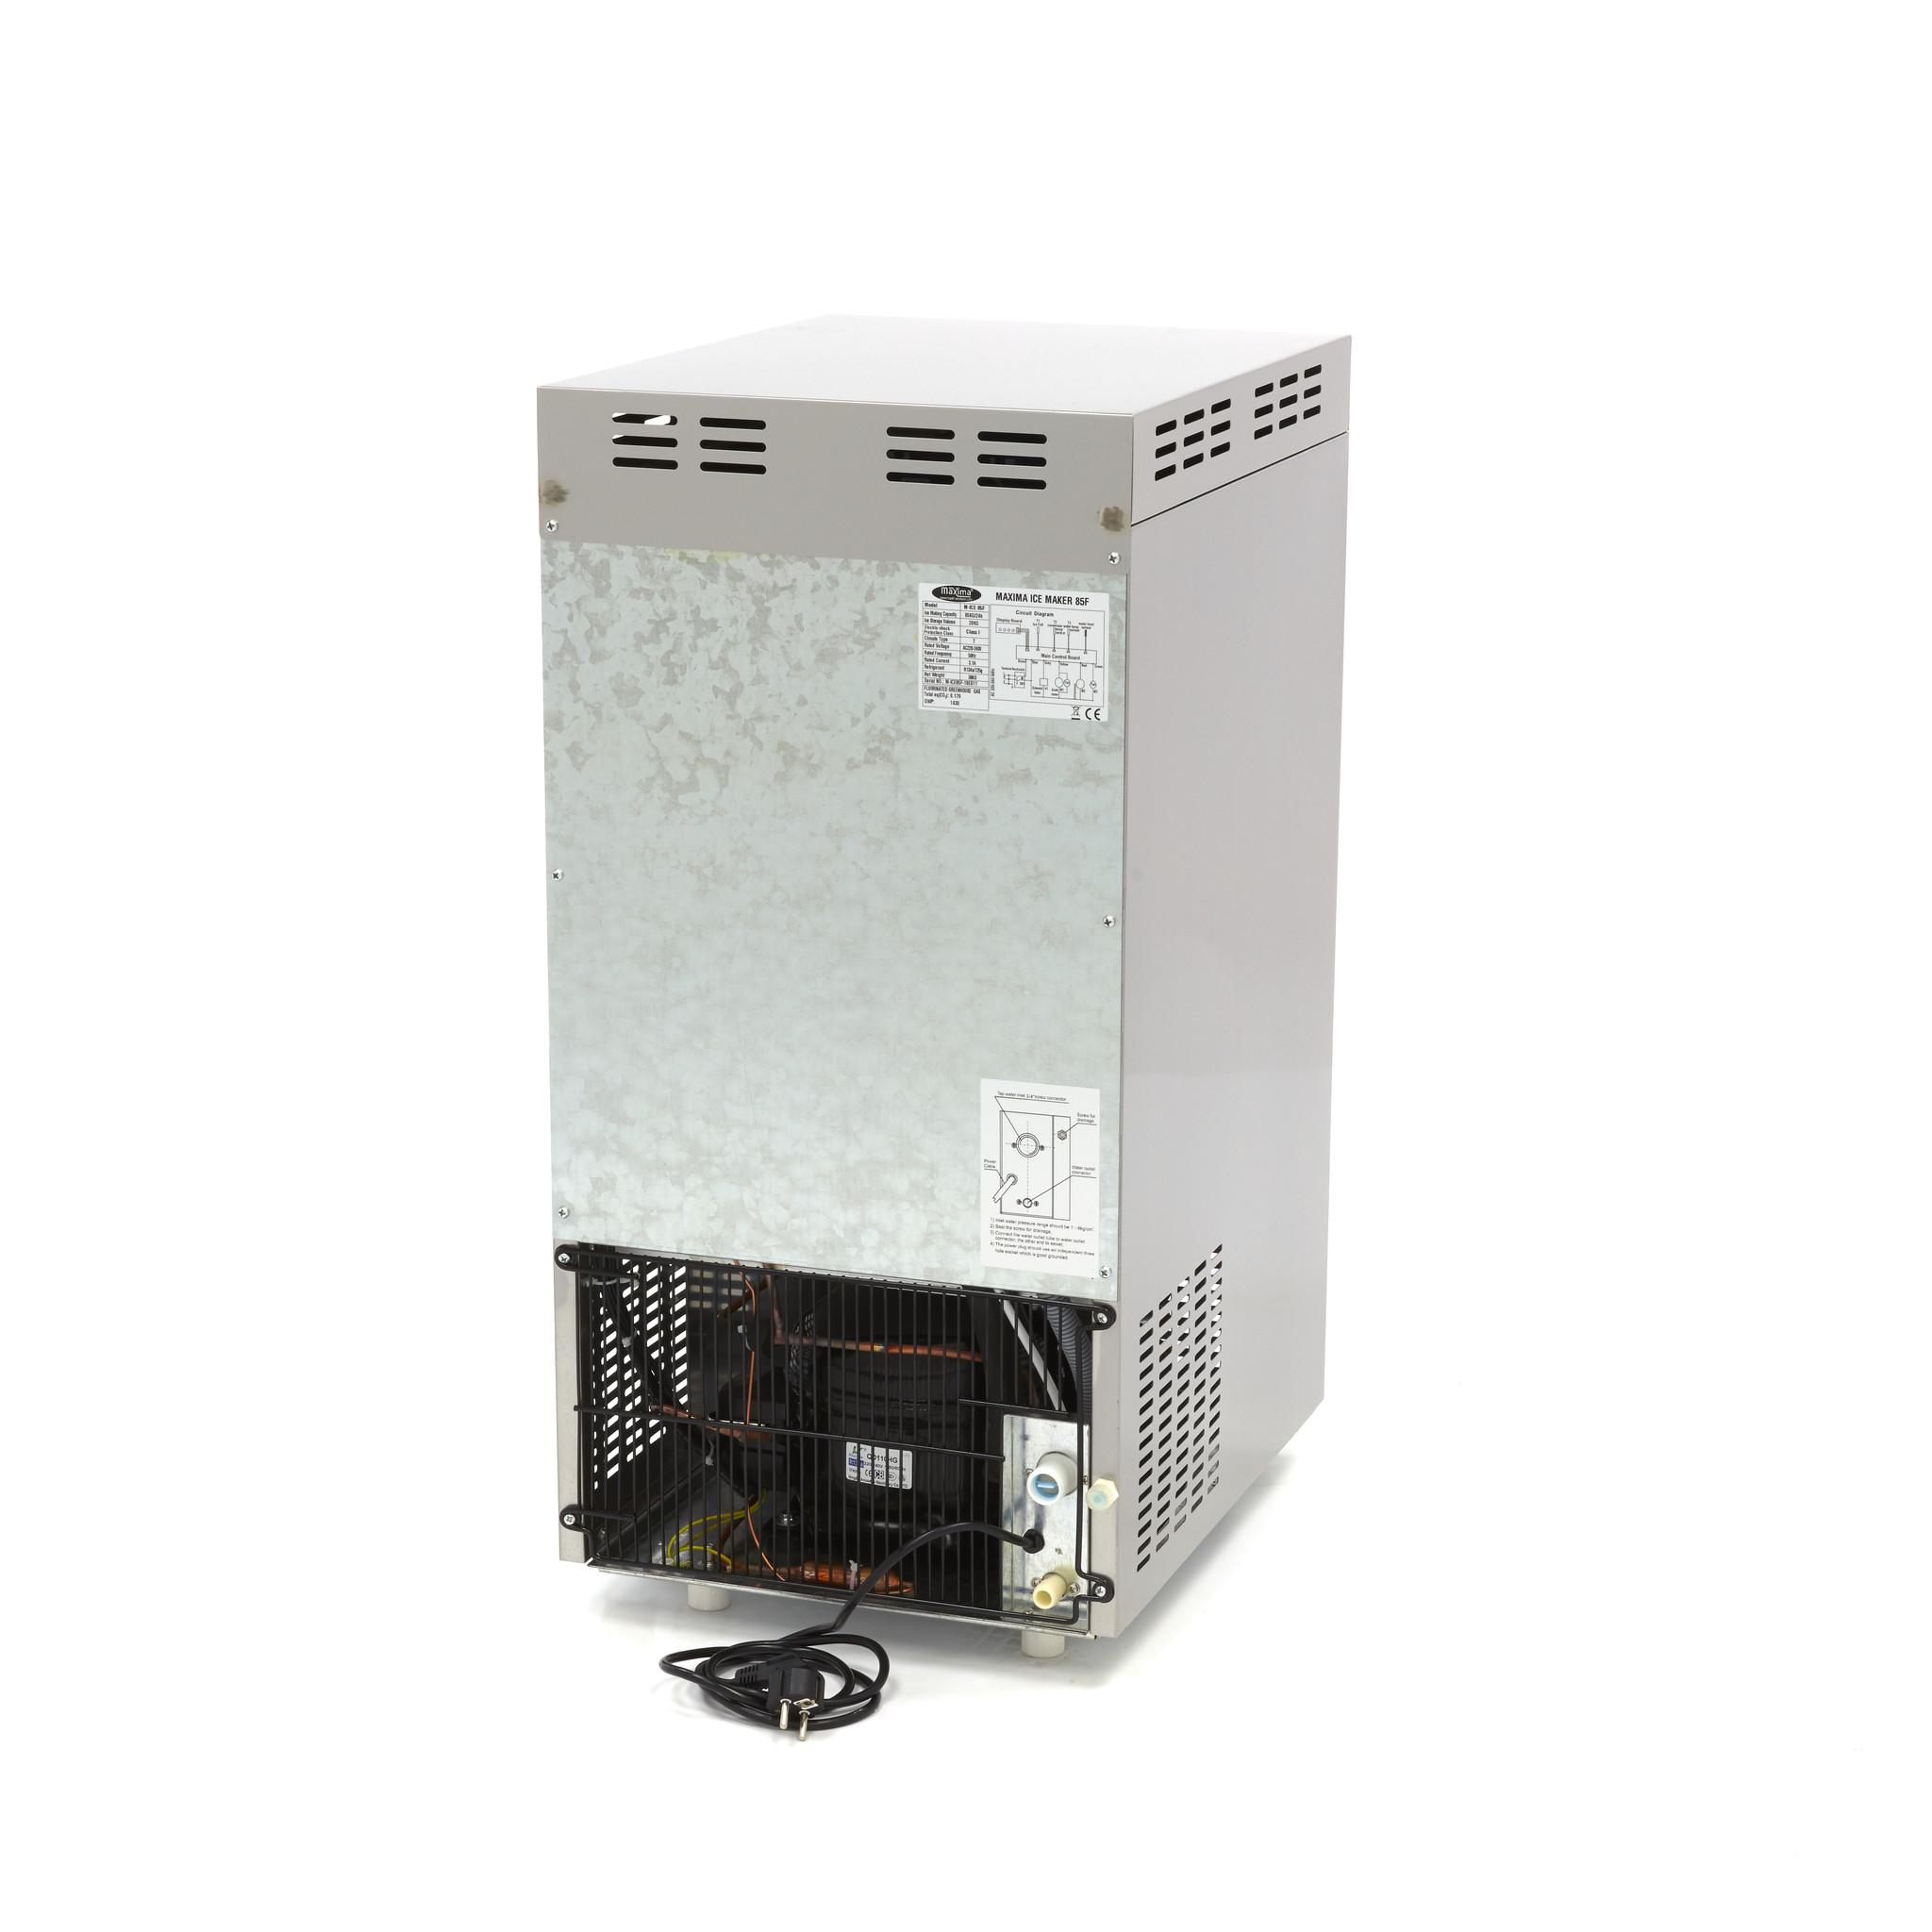 Flake Ice Crushed Ice Machine M Ice 85 Flake Water Cooled Maxima Kitchen Equipment